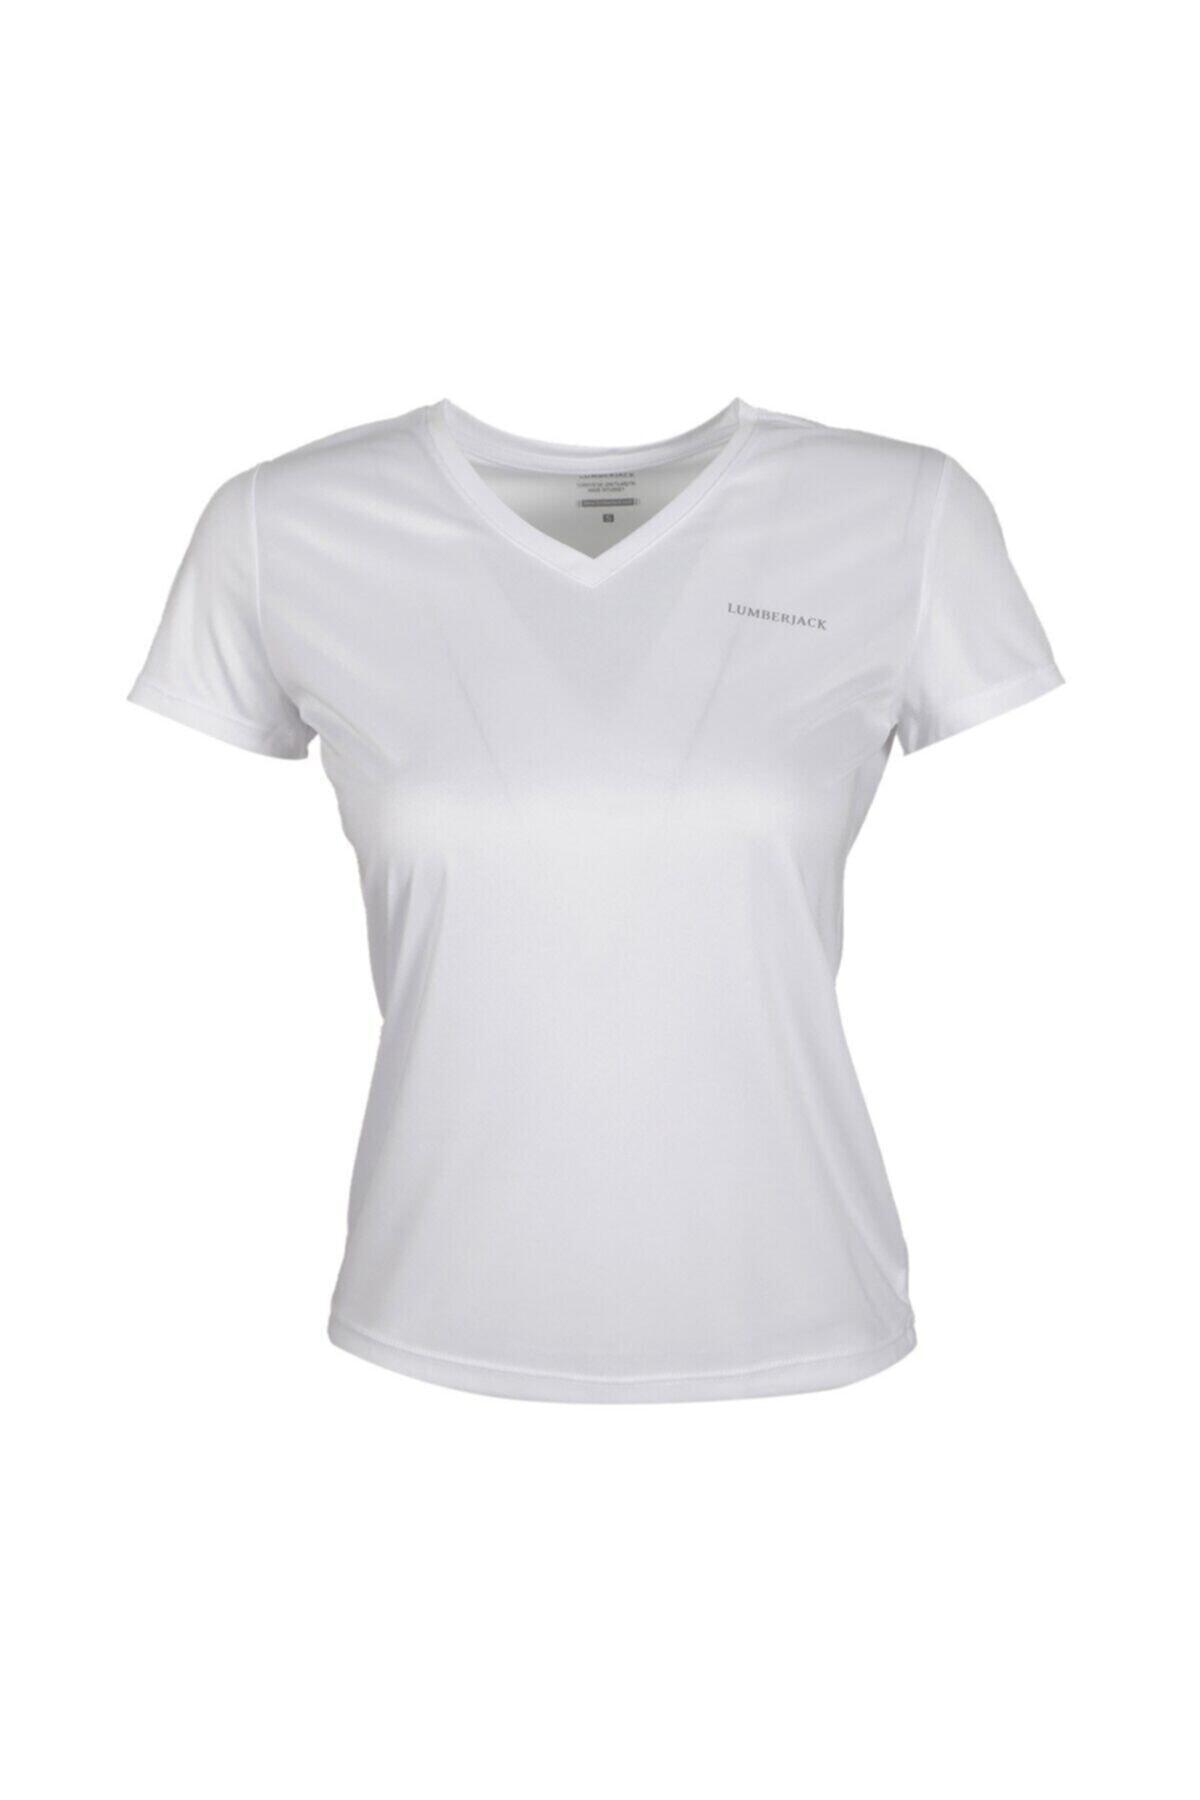 CT127 BASIC PES V NECK T- Beyaz Kadın T-Shirt 100581816